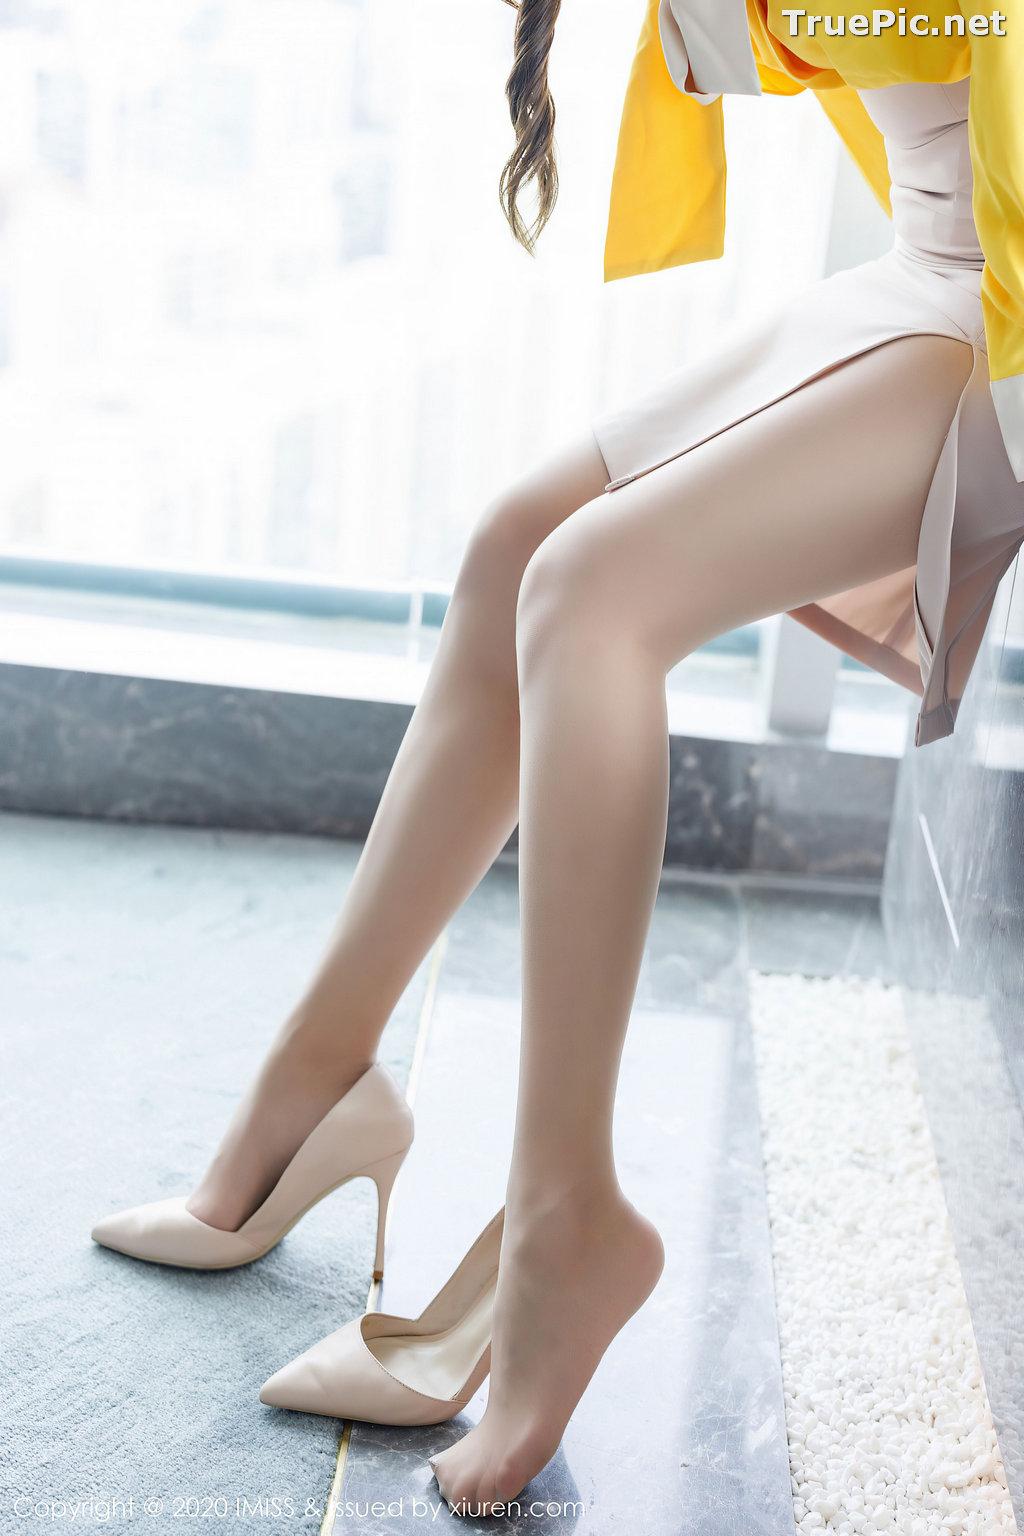 Image IMISS Vol.494 - Chinese Model - Lavinia肉肉 - Beautiful Long Legs Secretary - TruePic.net - Picture-10